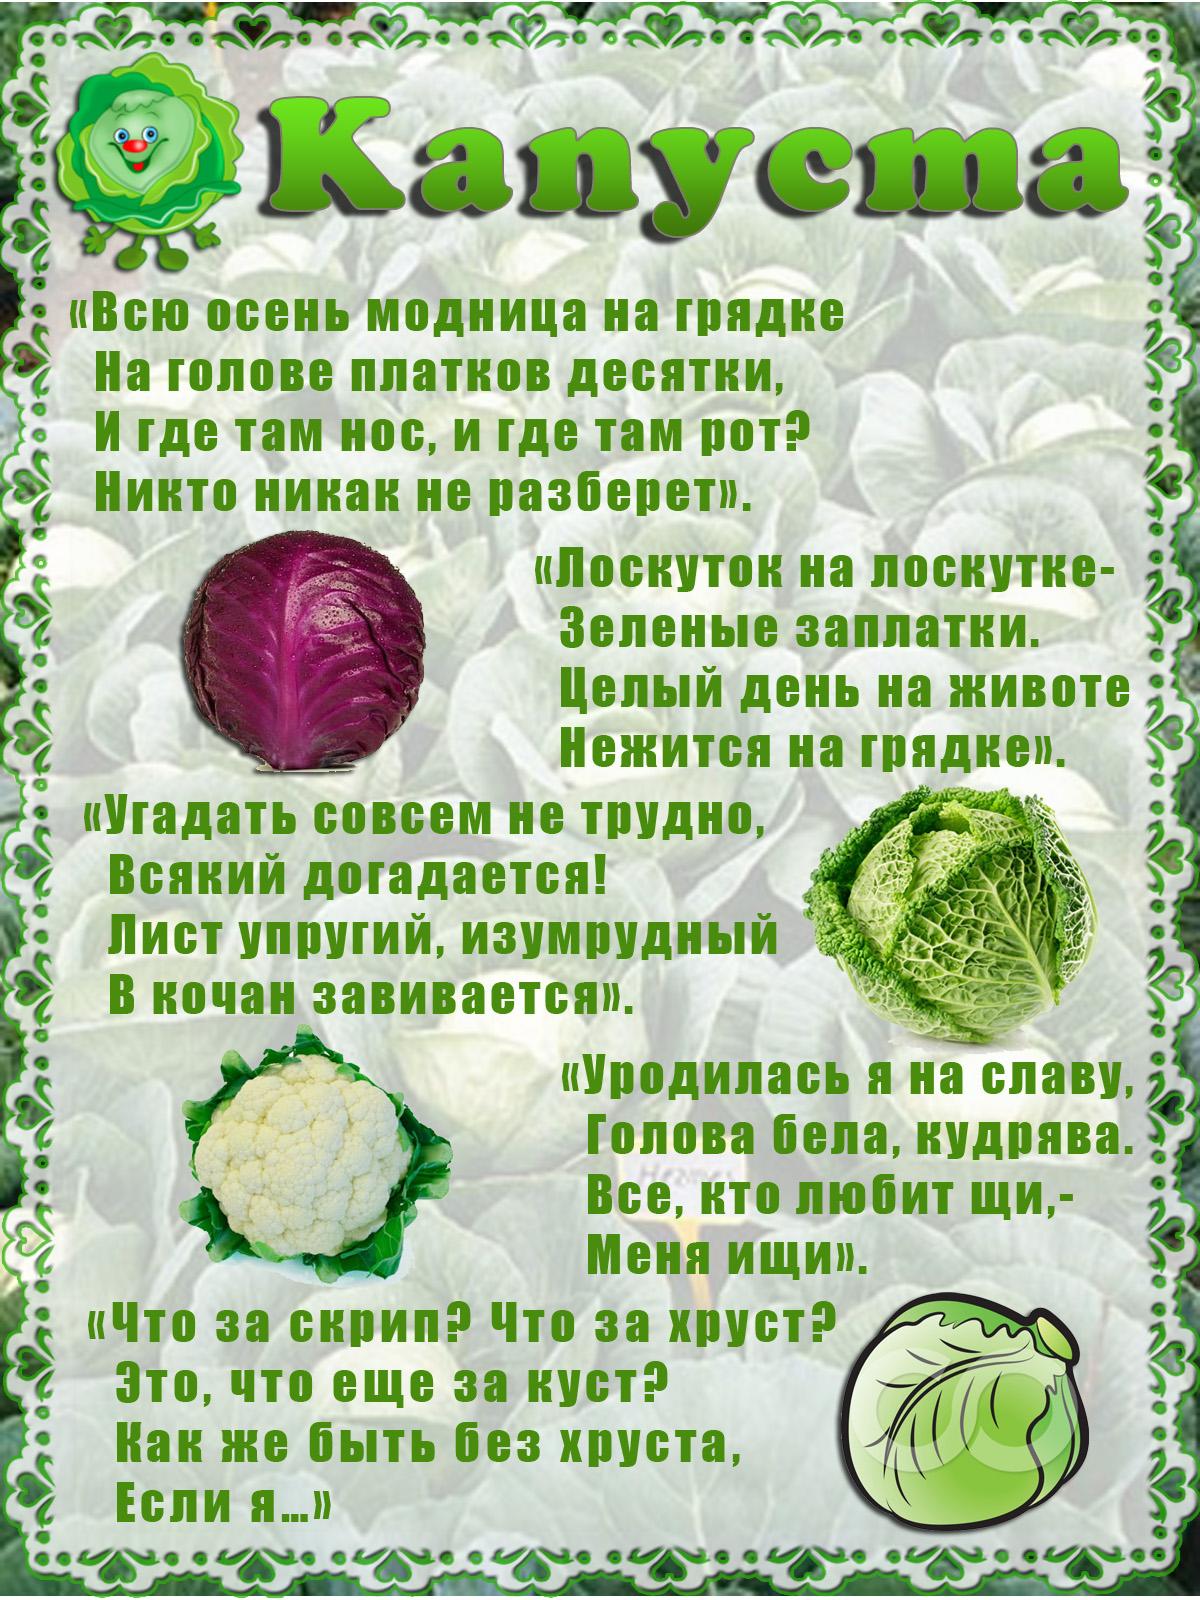 интересный пословицы про овощи с картинками дерева, обивка